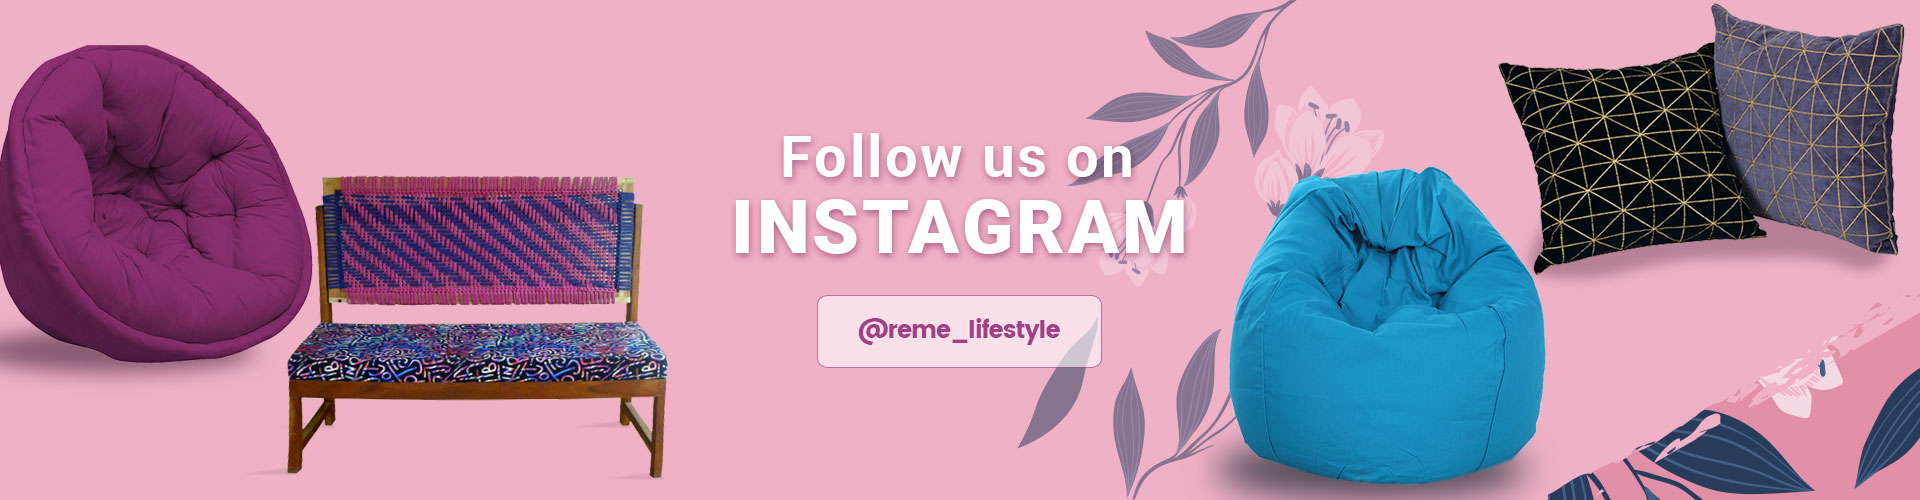 Reme Instagram Banner